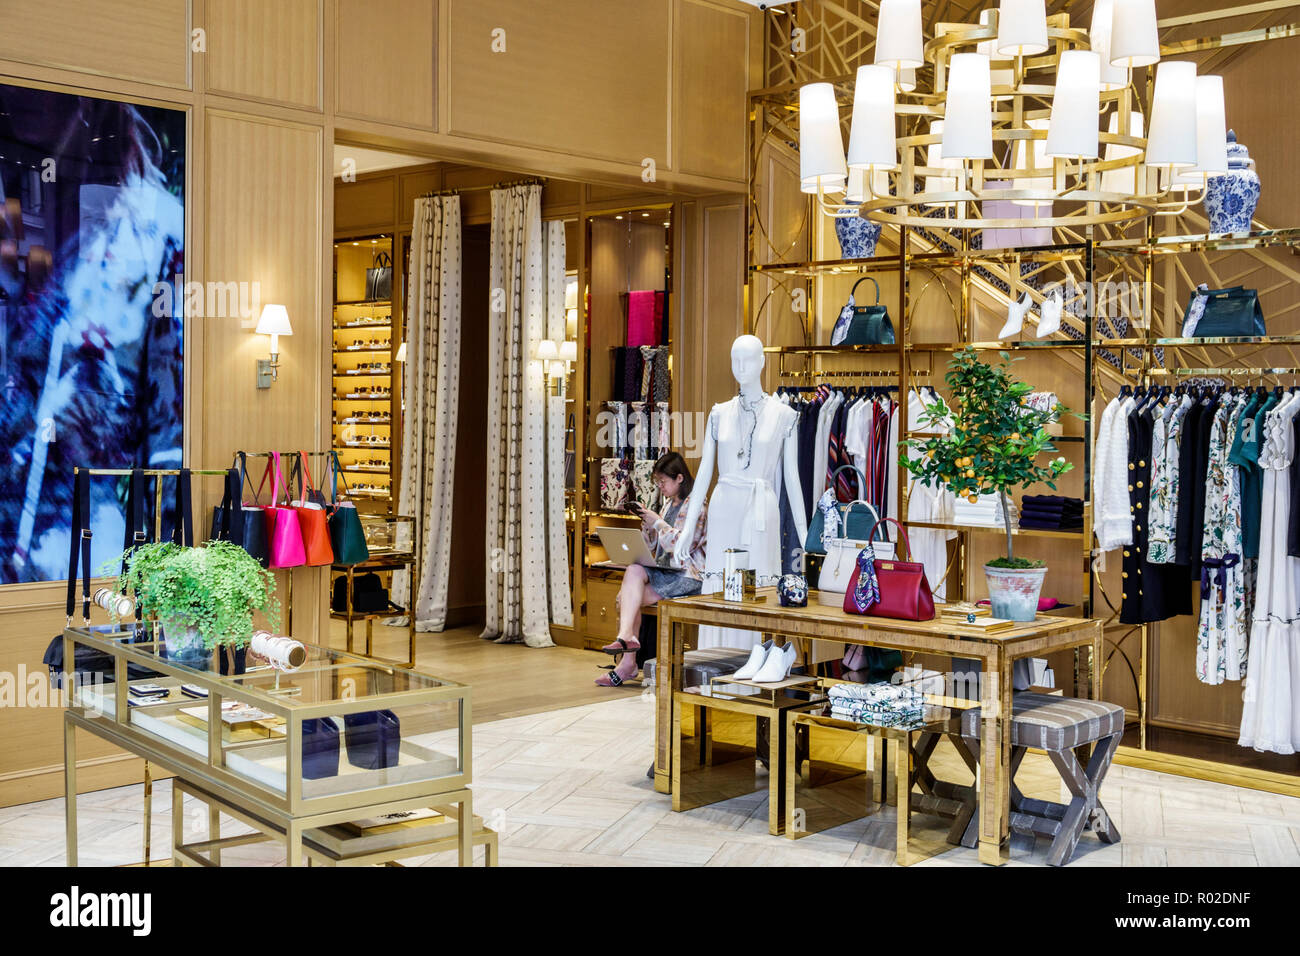 64100c31659 London England United Kingdom Great Britain Mayfair Tory Burch shopping  store designer boutique upmarket women s fashion handbags clothing Asian  woman